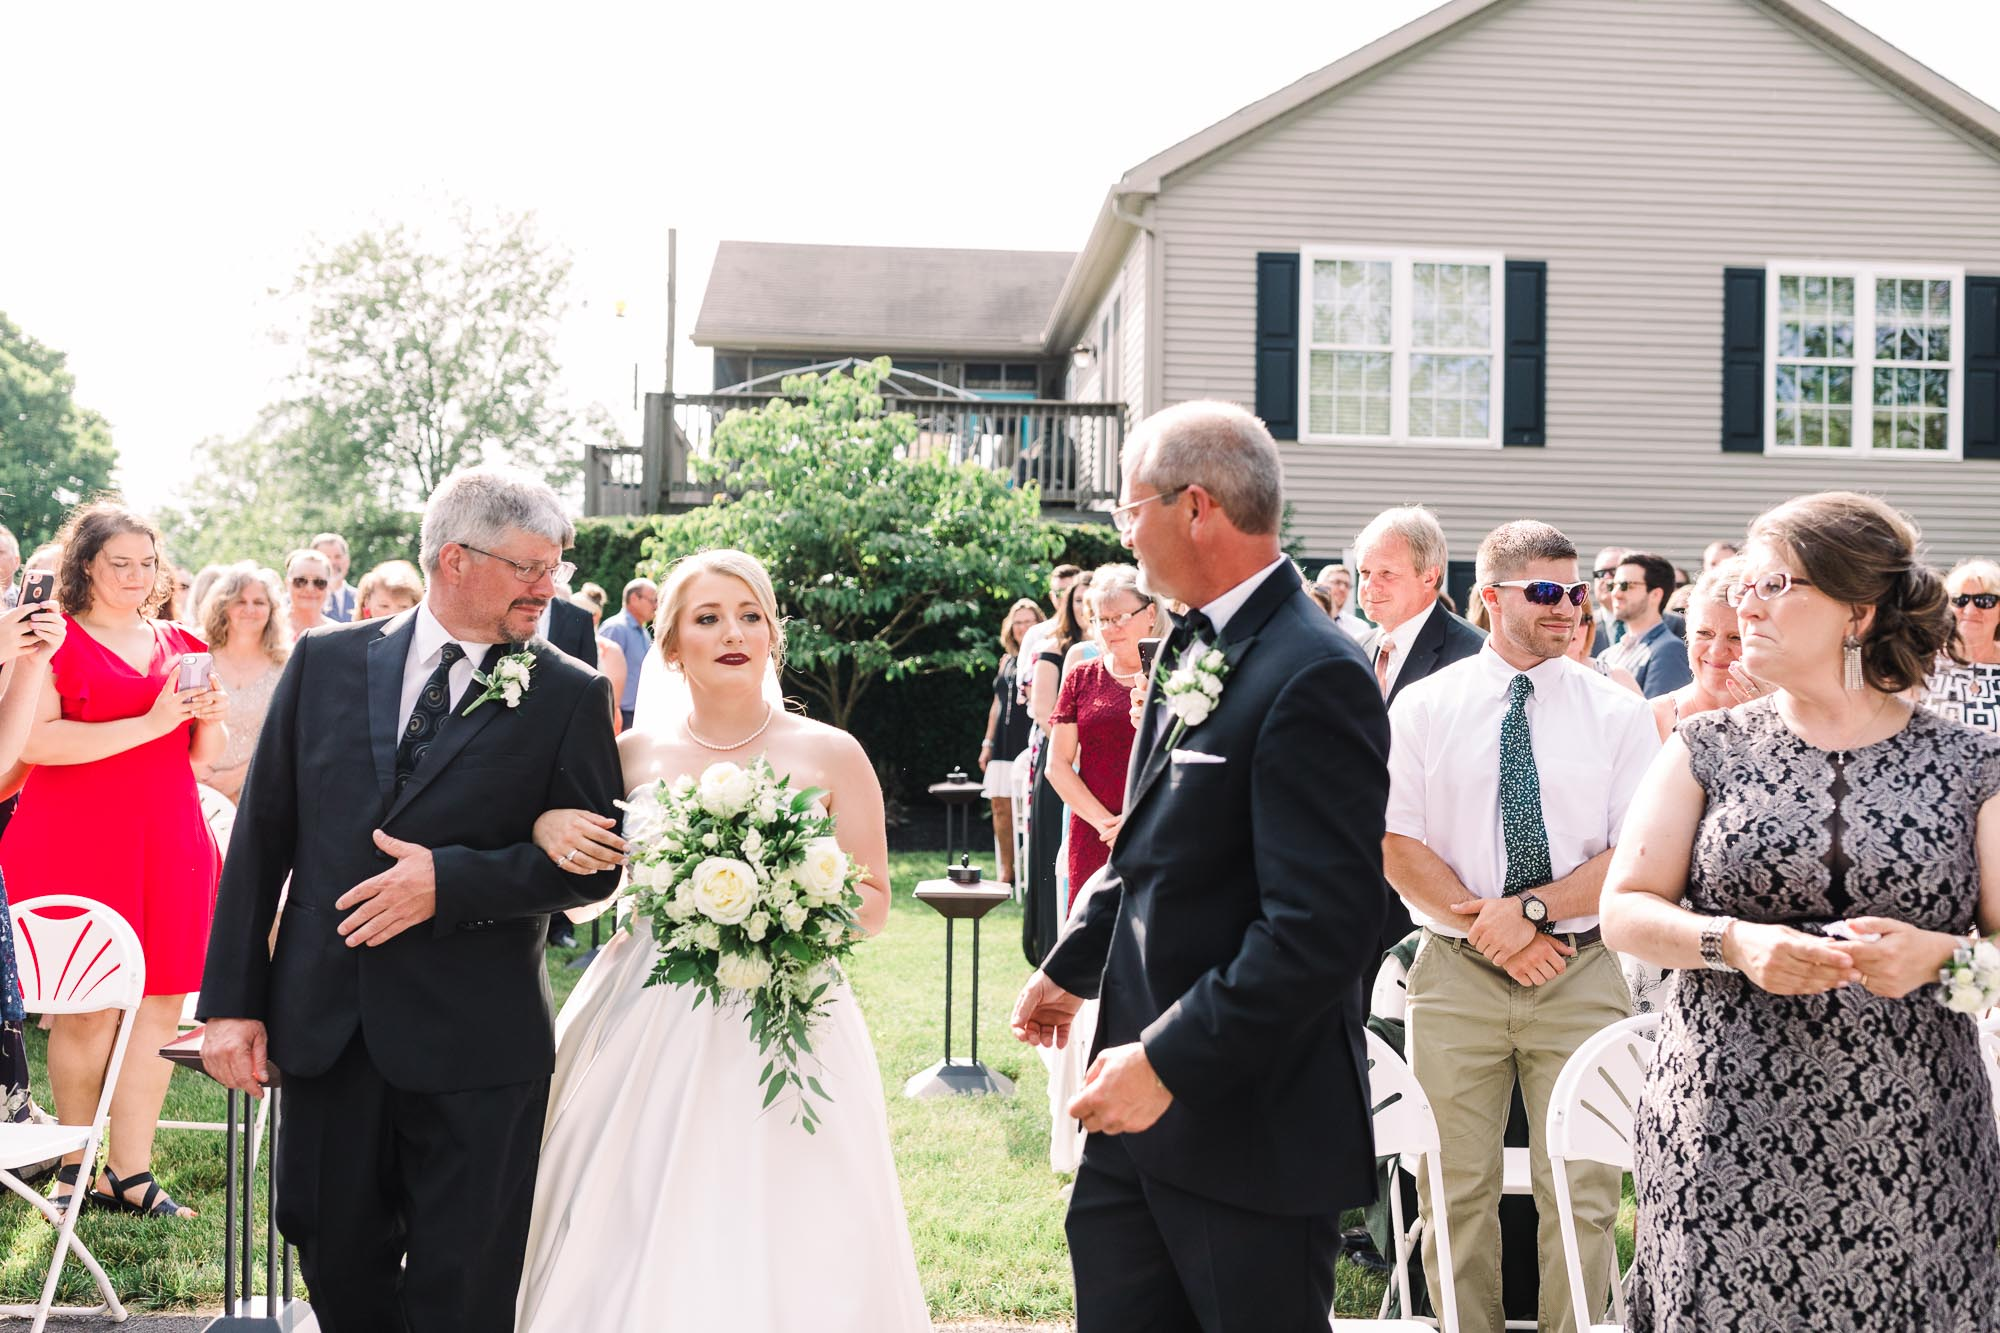 isle-of-que-wedding-6710.jpg